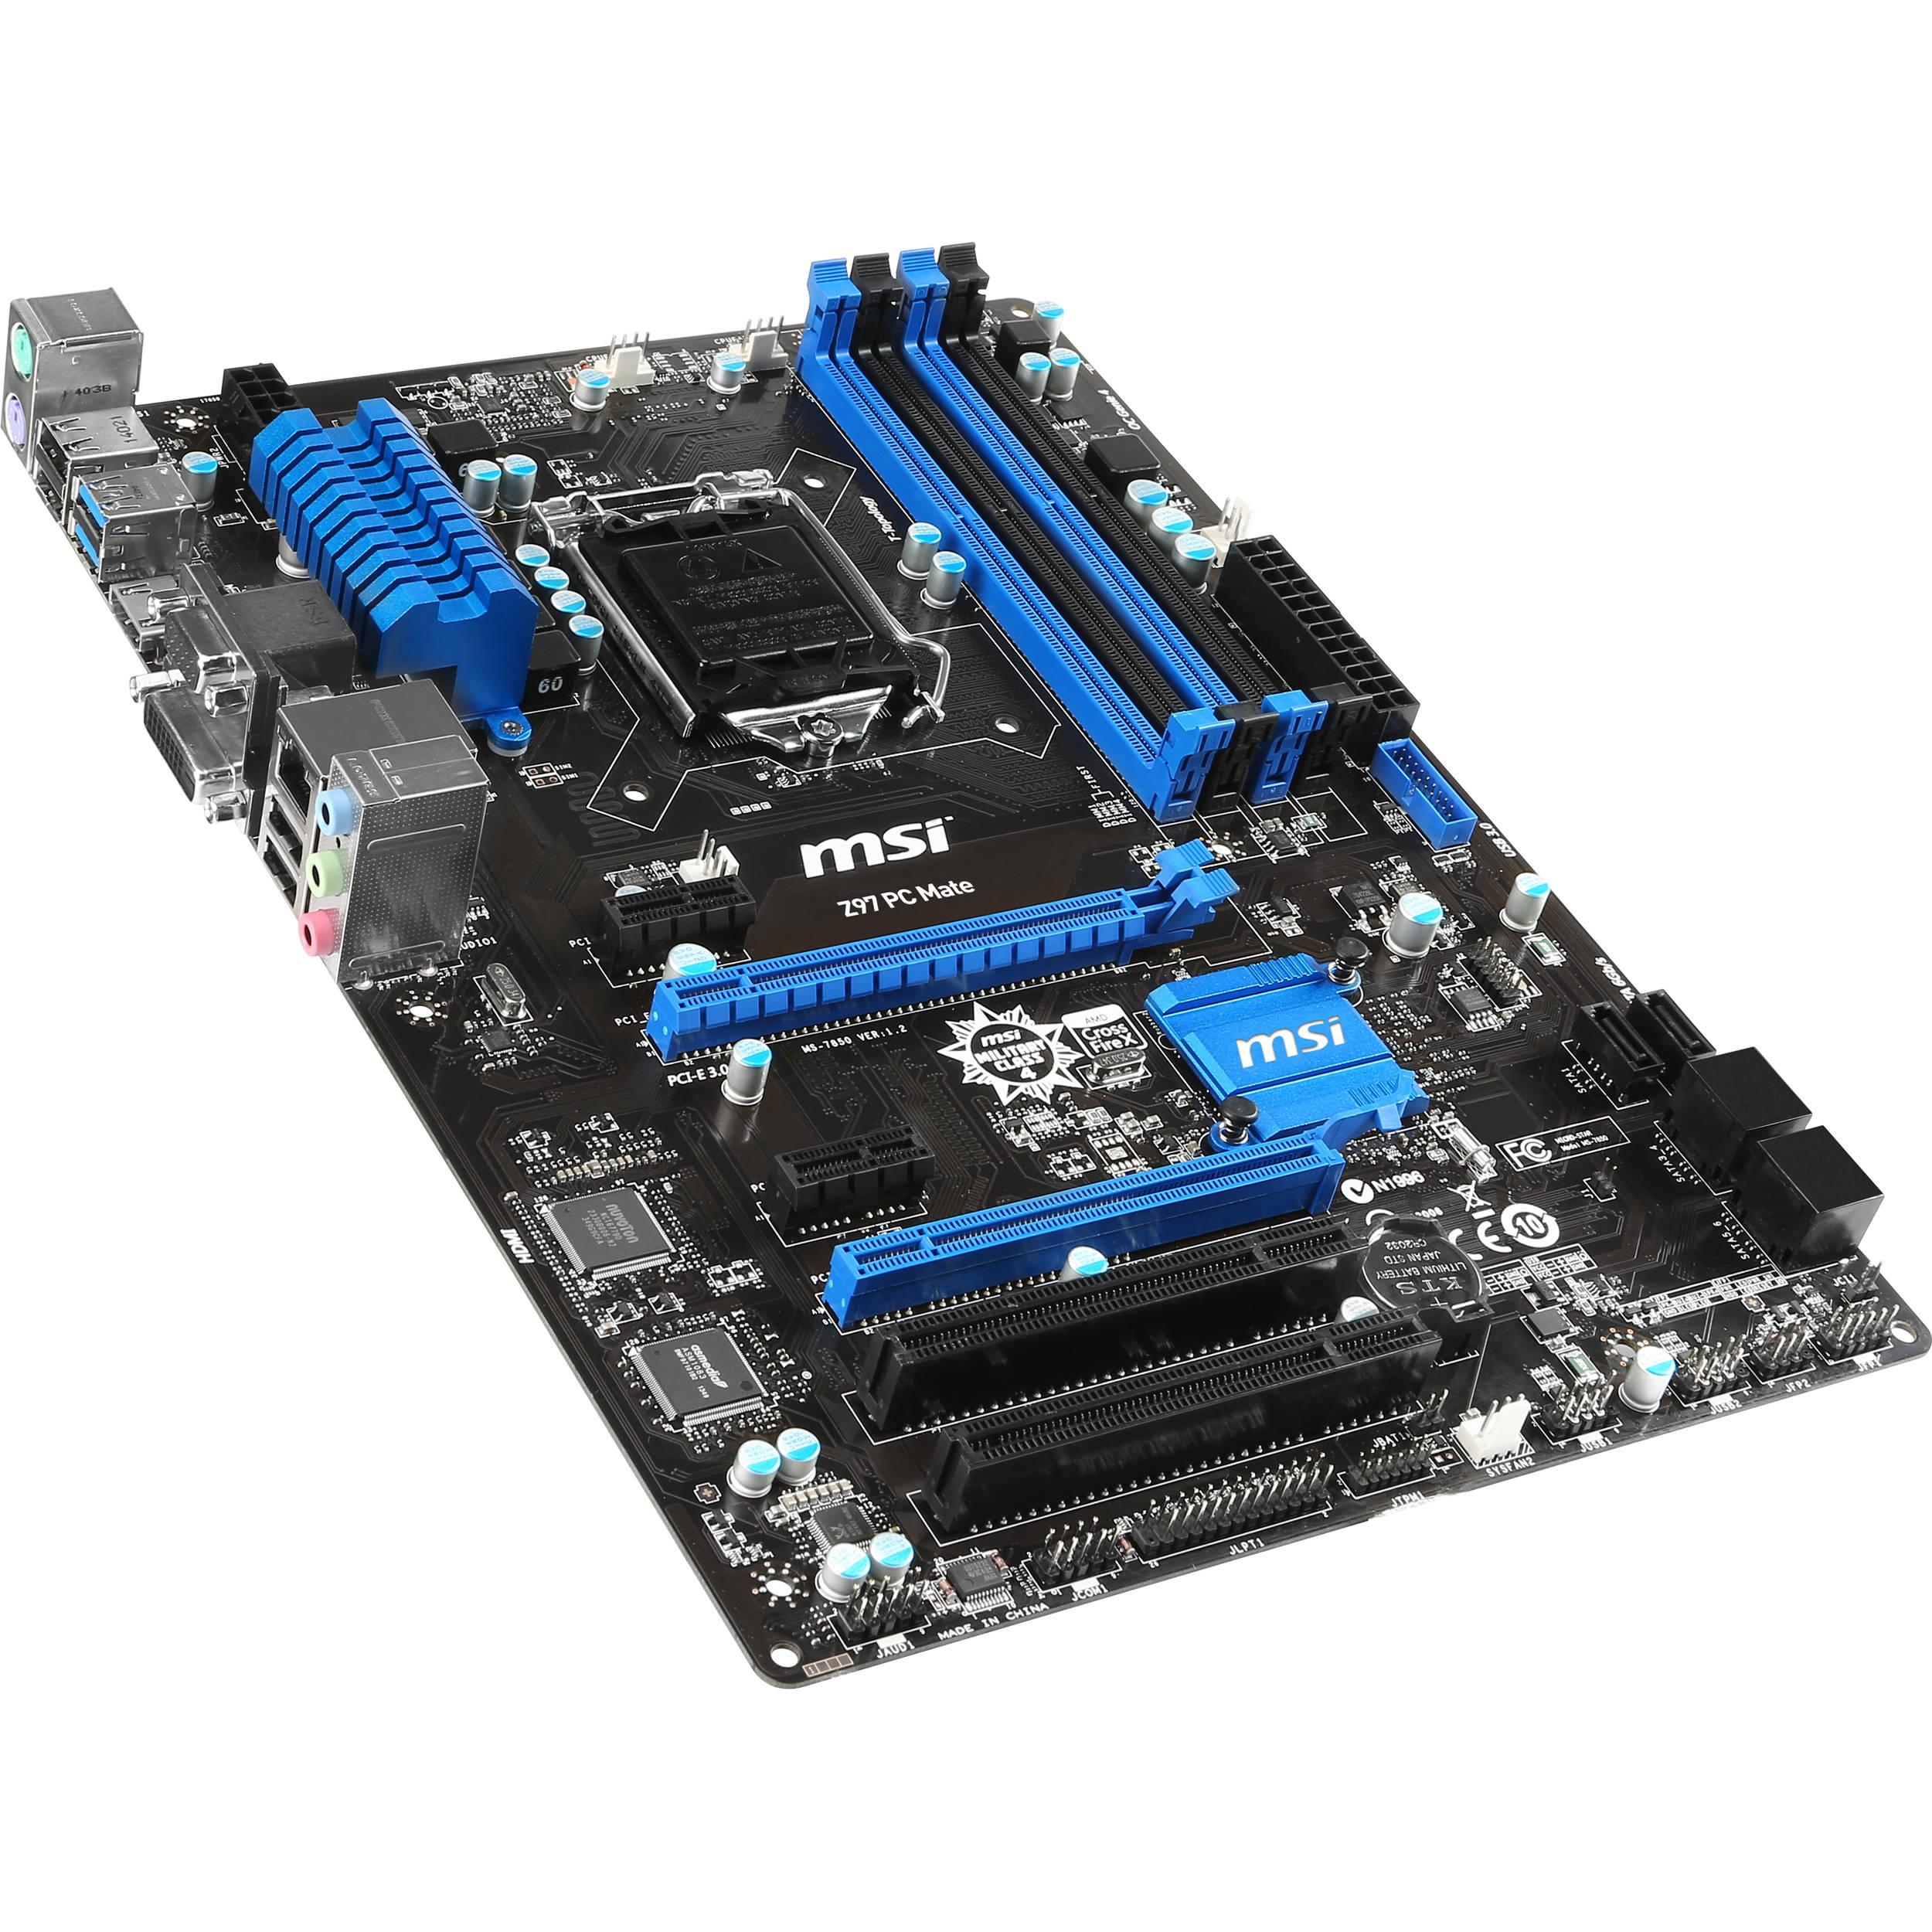 MSI Z97 PC MATE Motherboard